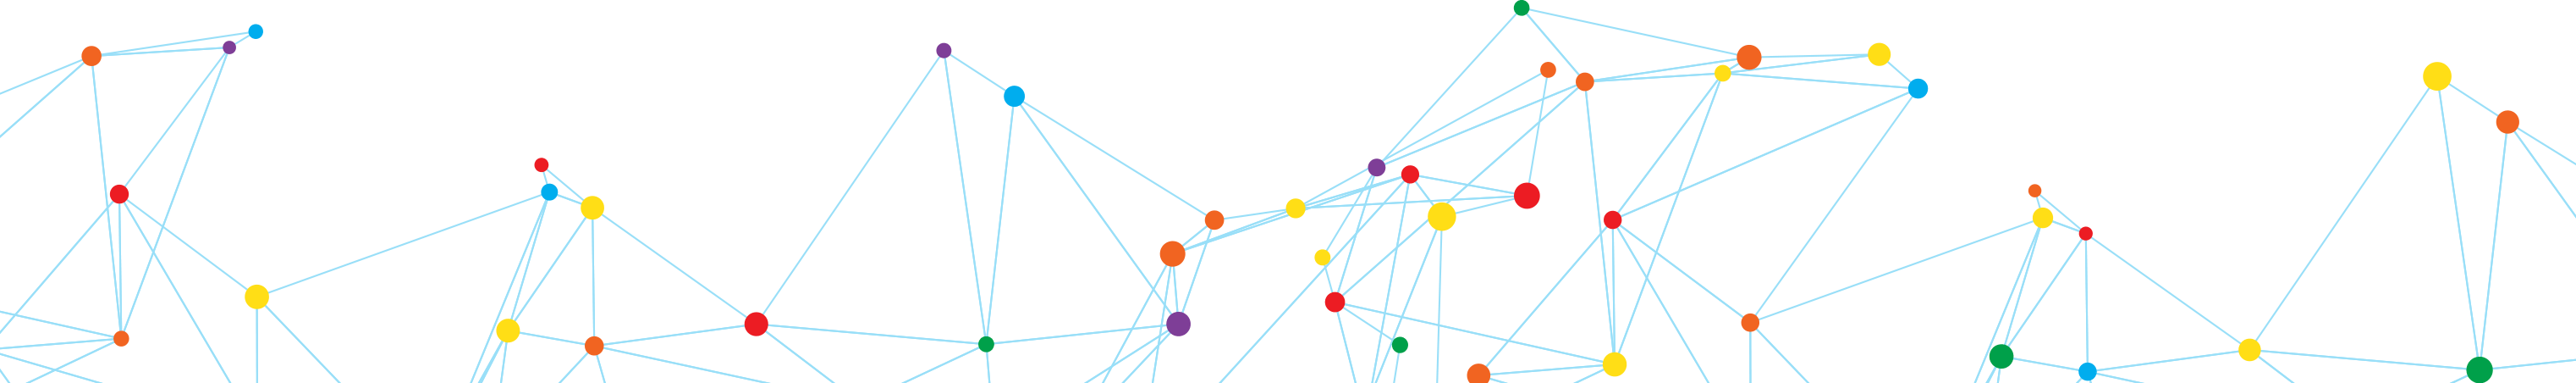 DNA dots